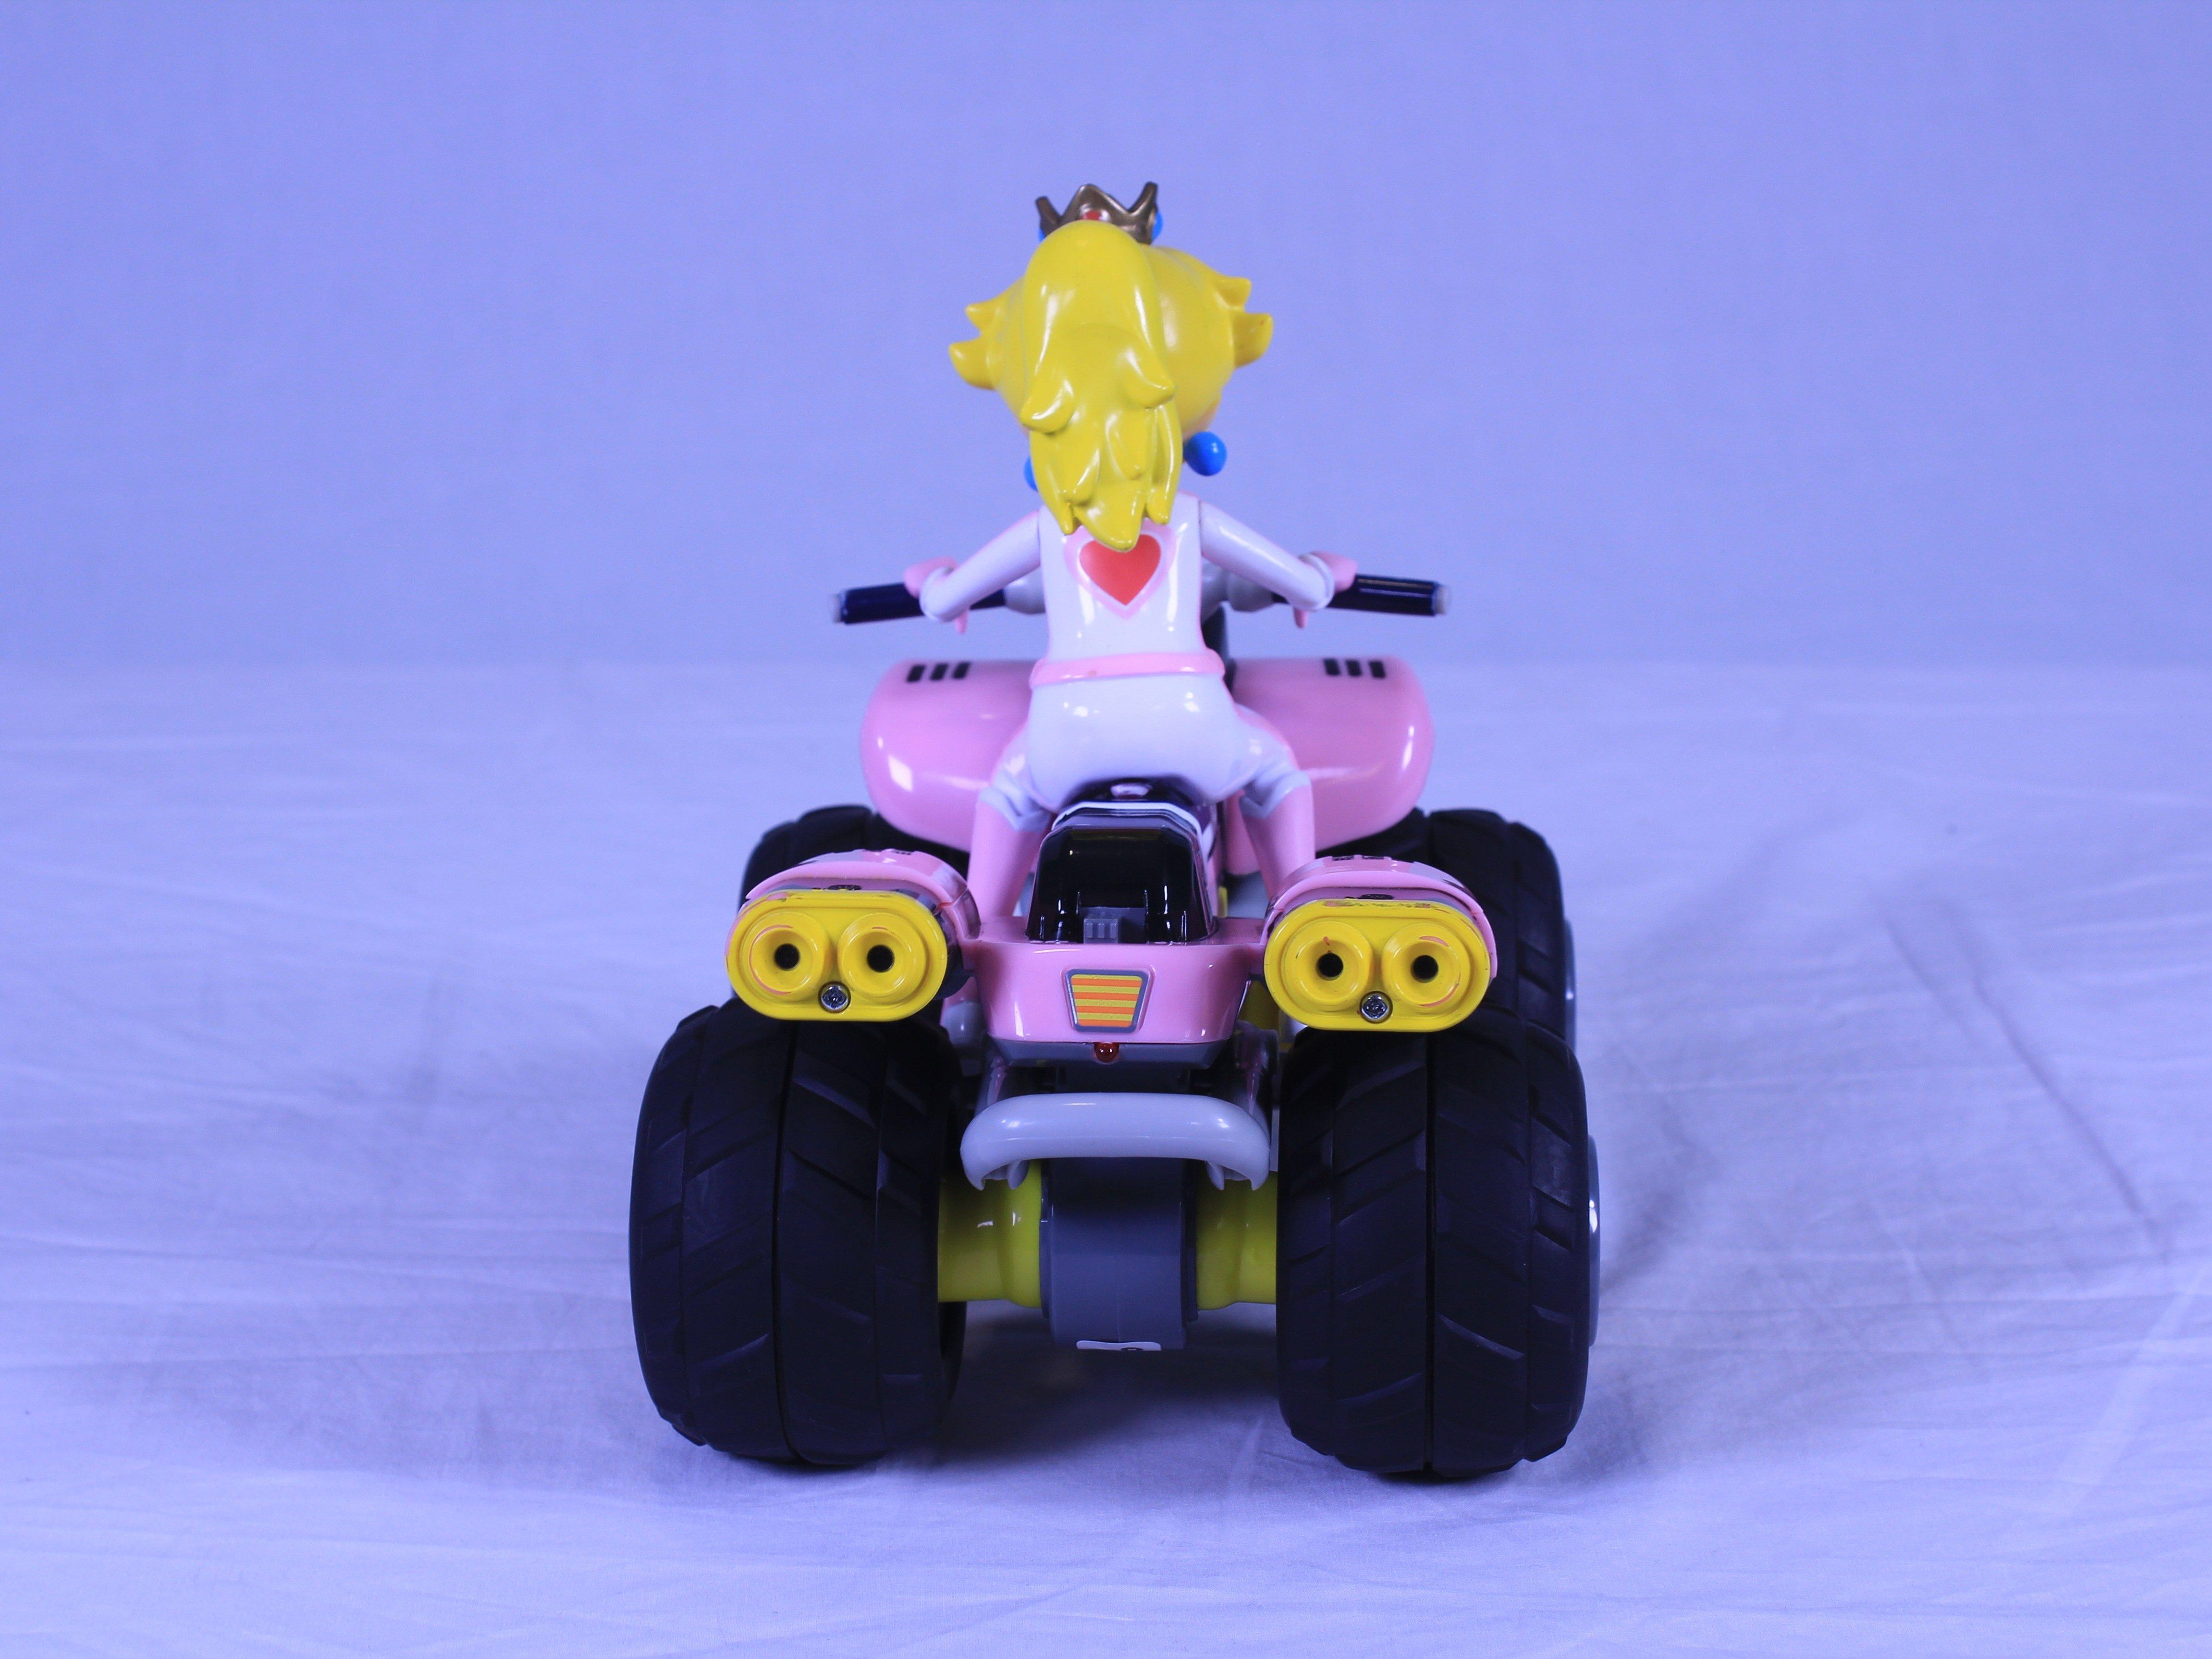 Carrera Mario Kart 8 Peach Battery Replacement Ifixit